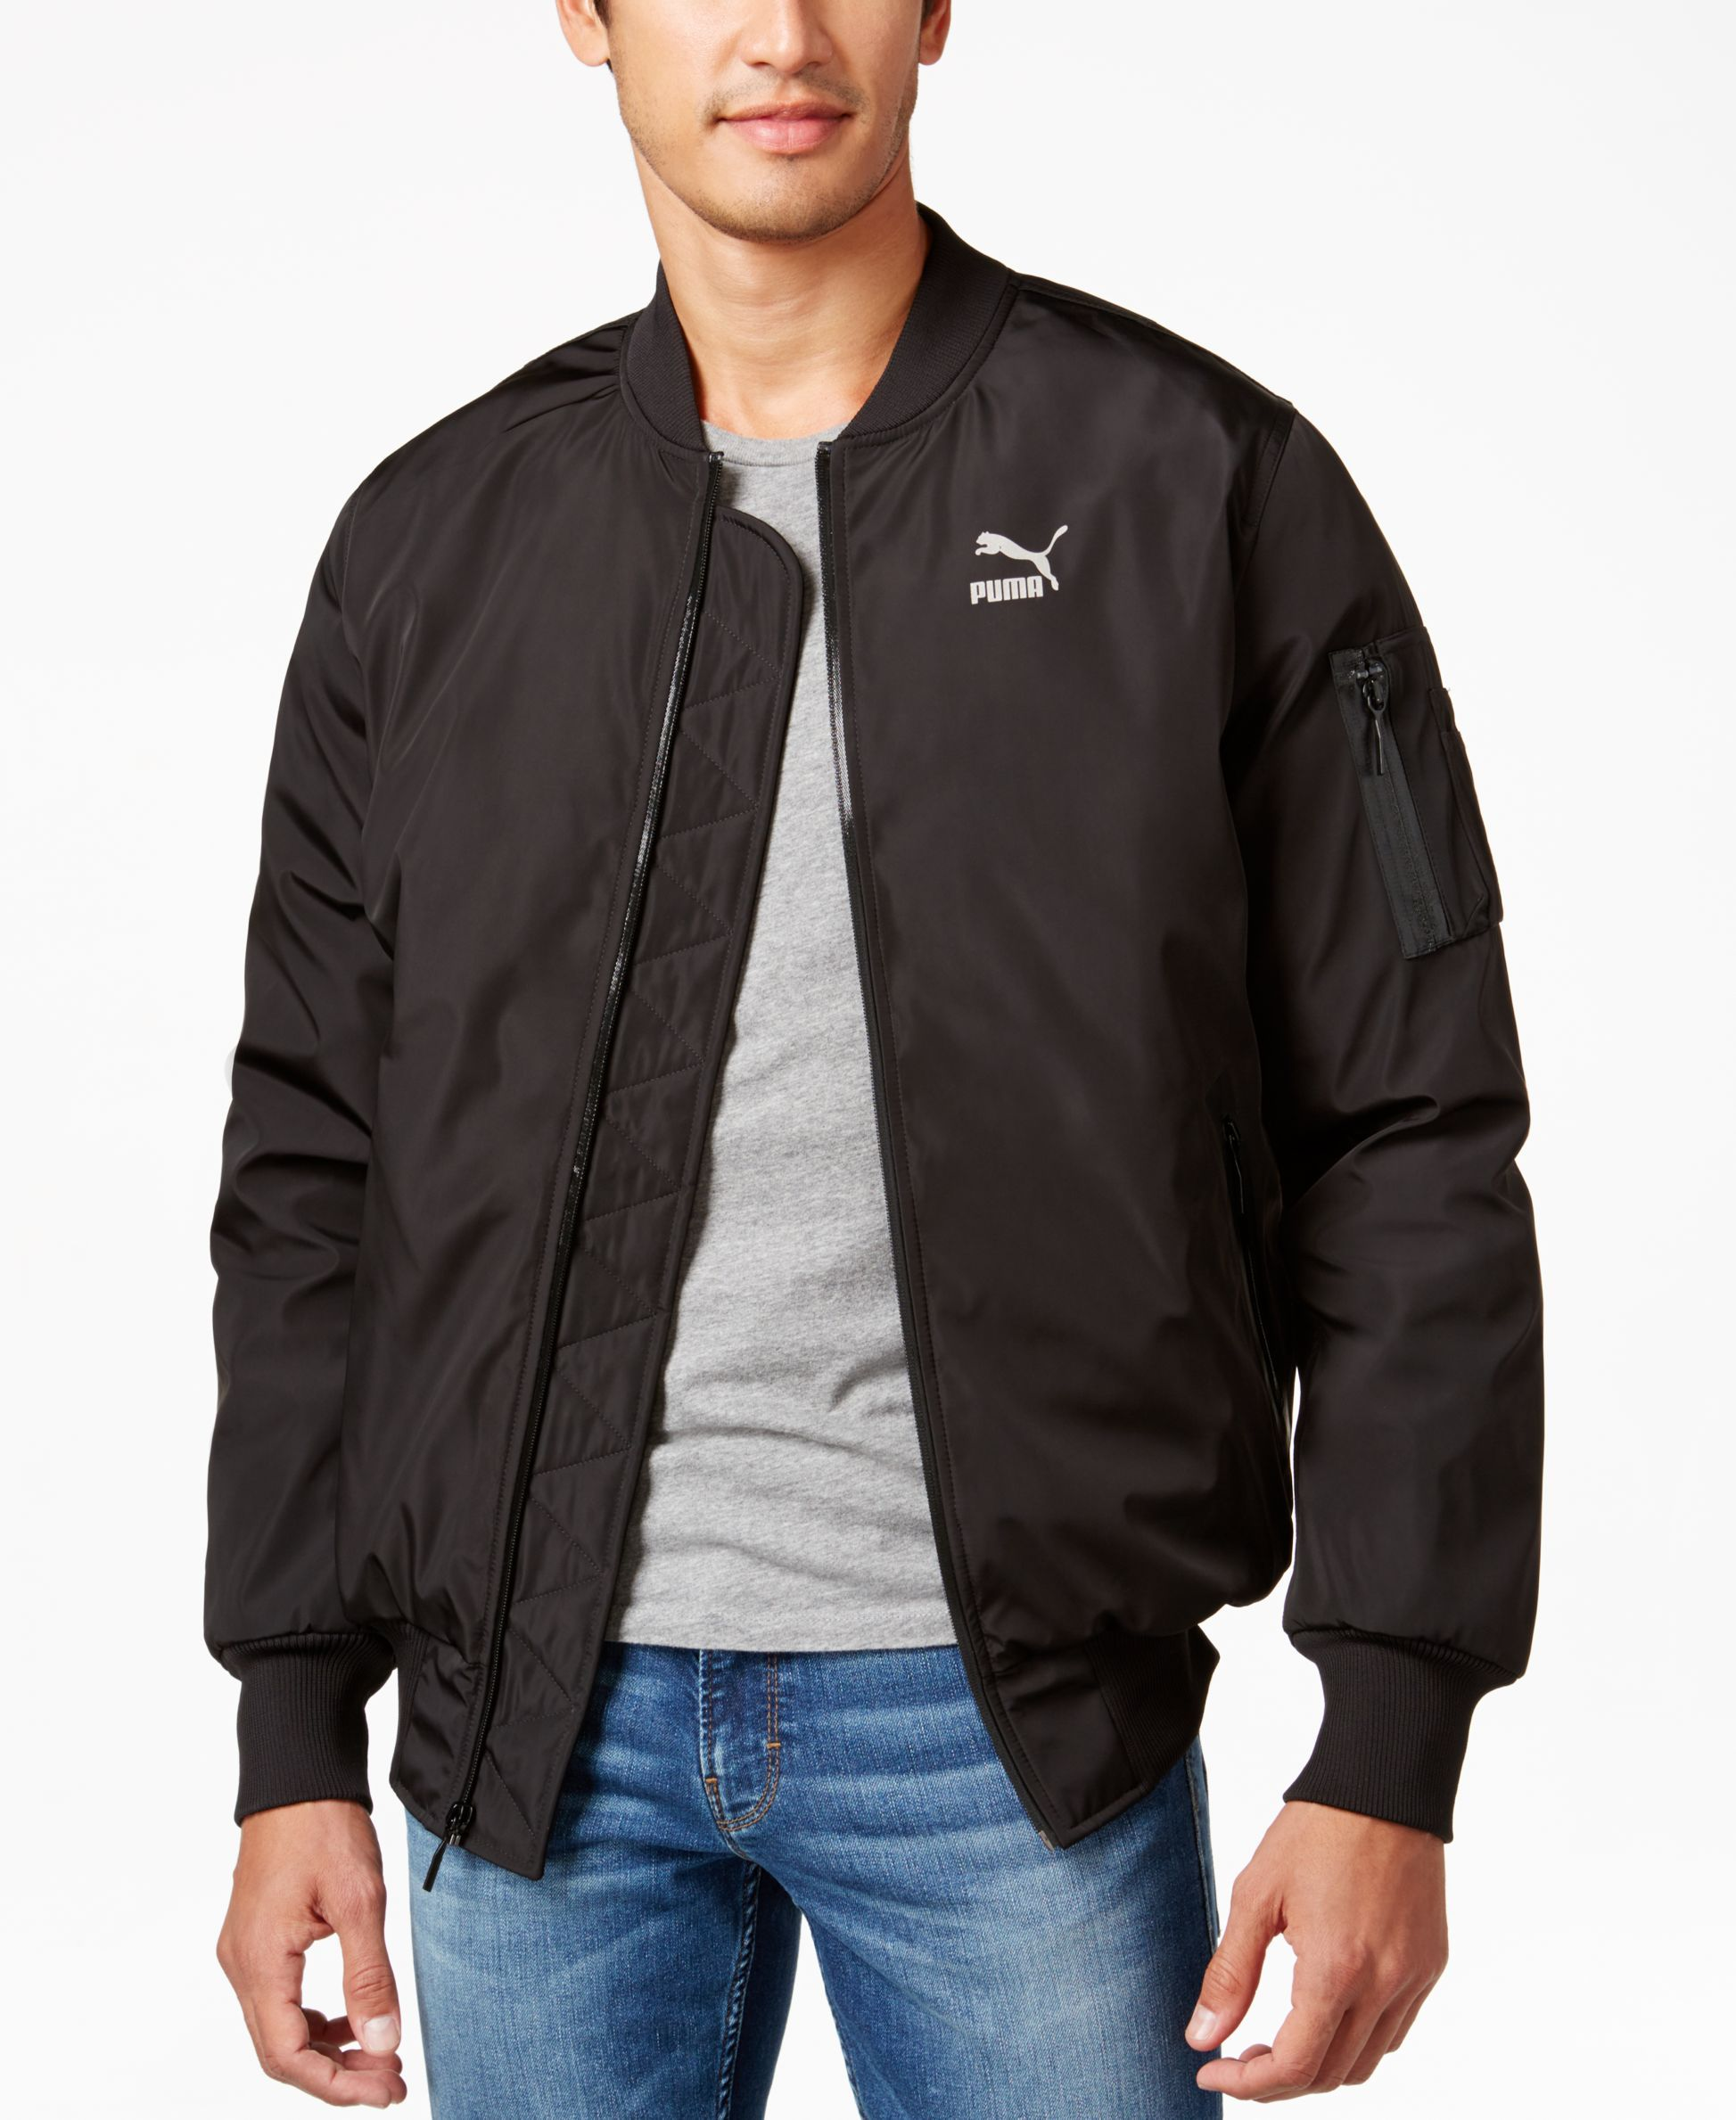 Puma Men S Evo Bomber Jacket Coats Jackets Men Macy S Bomber Jacket Jackets Puma Mens [ 2378 x 1947 Pixel ]